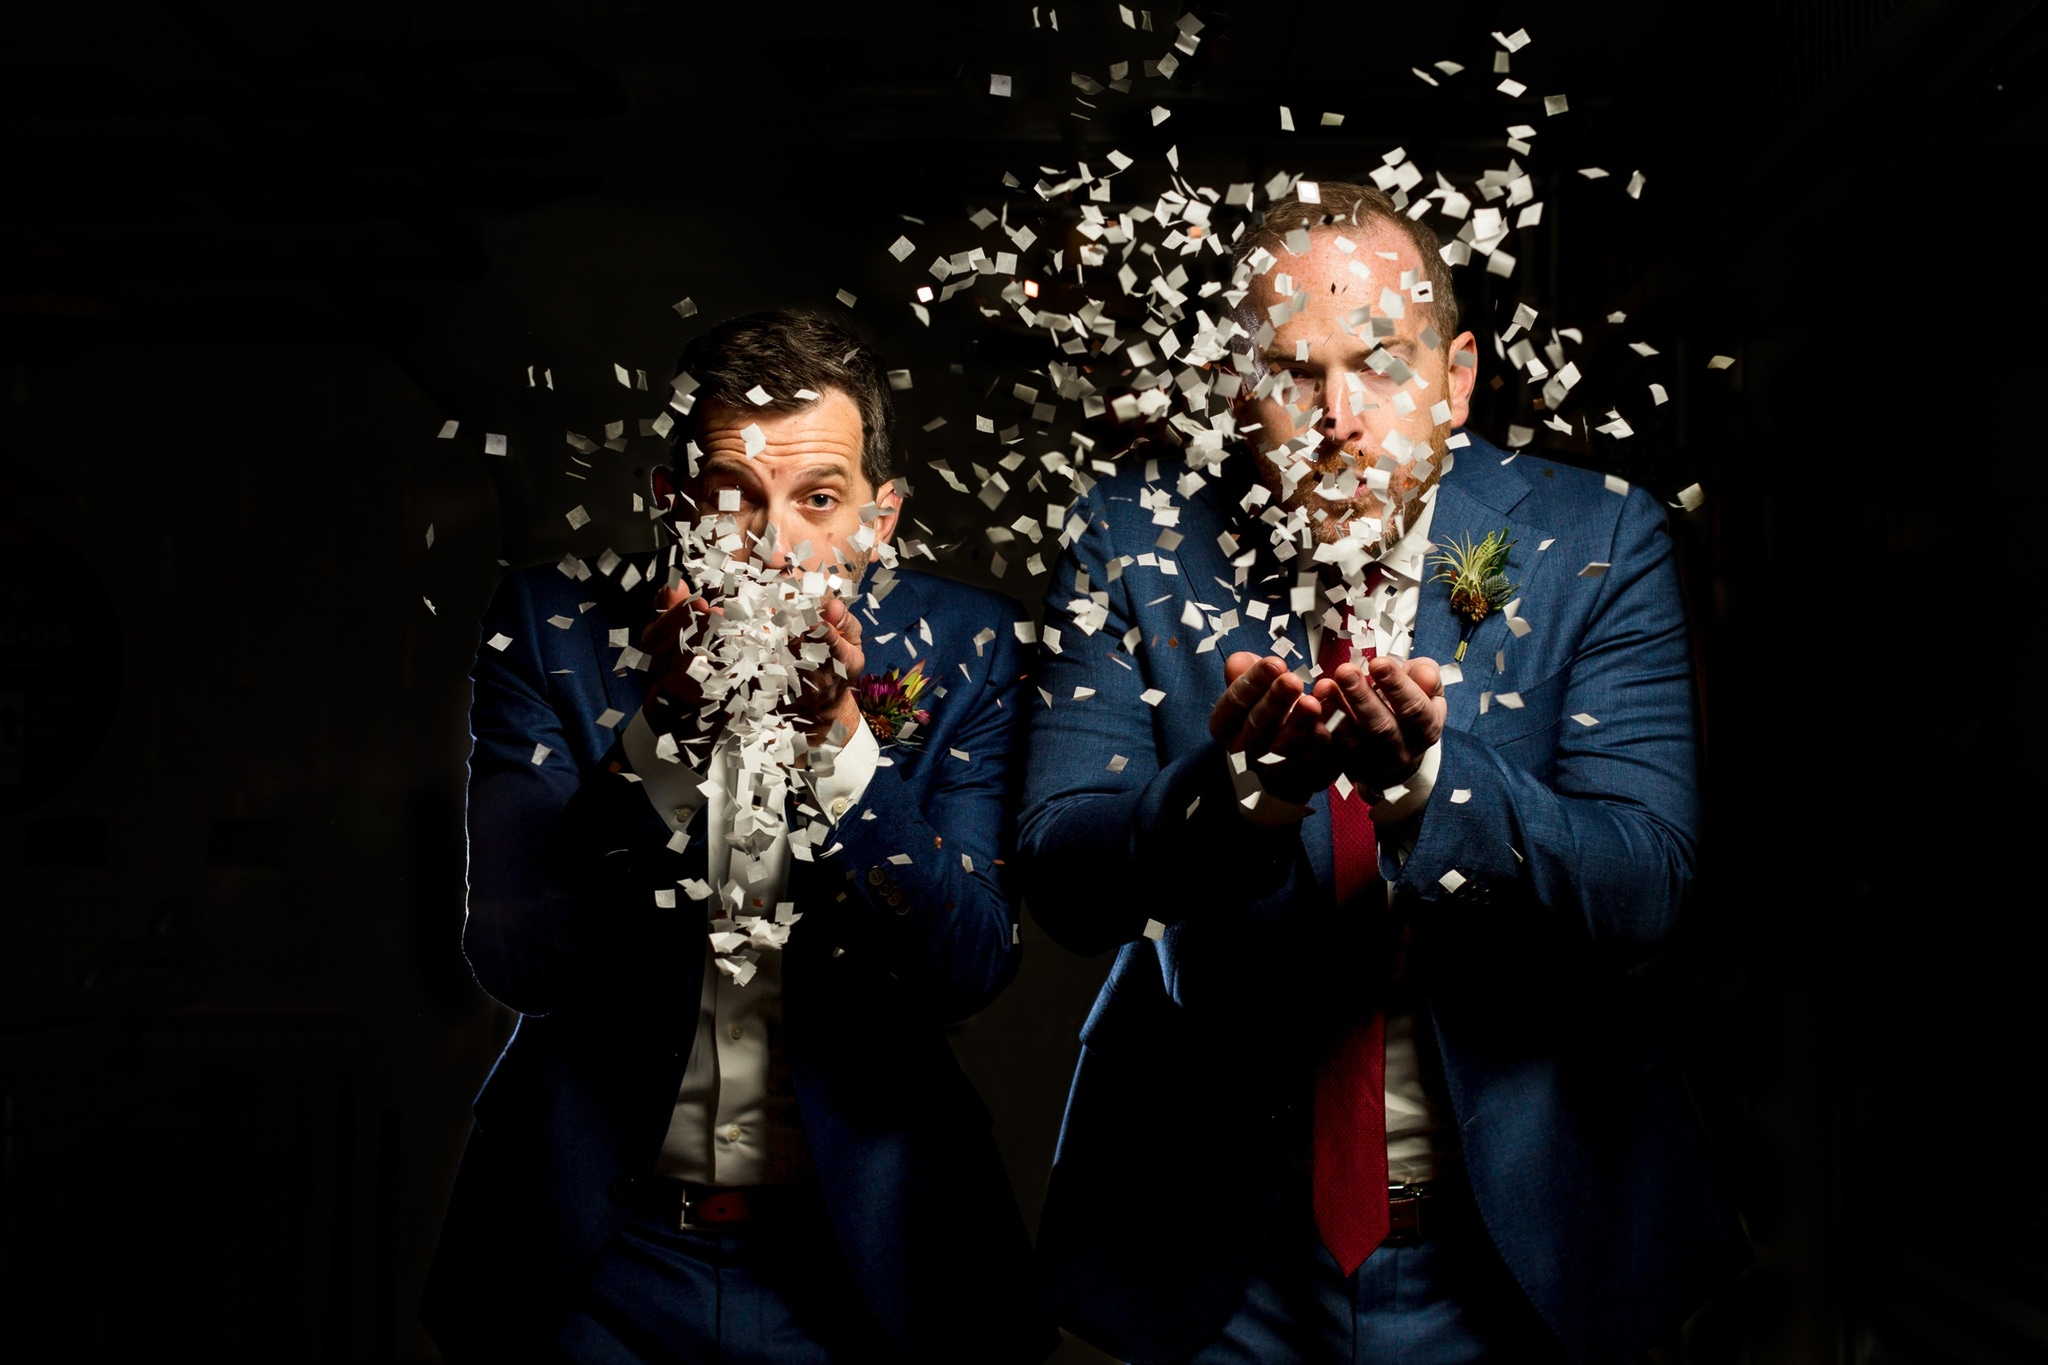 Couple blowing glitter